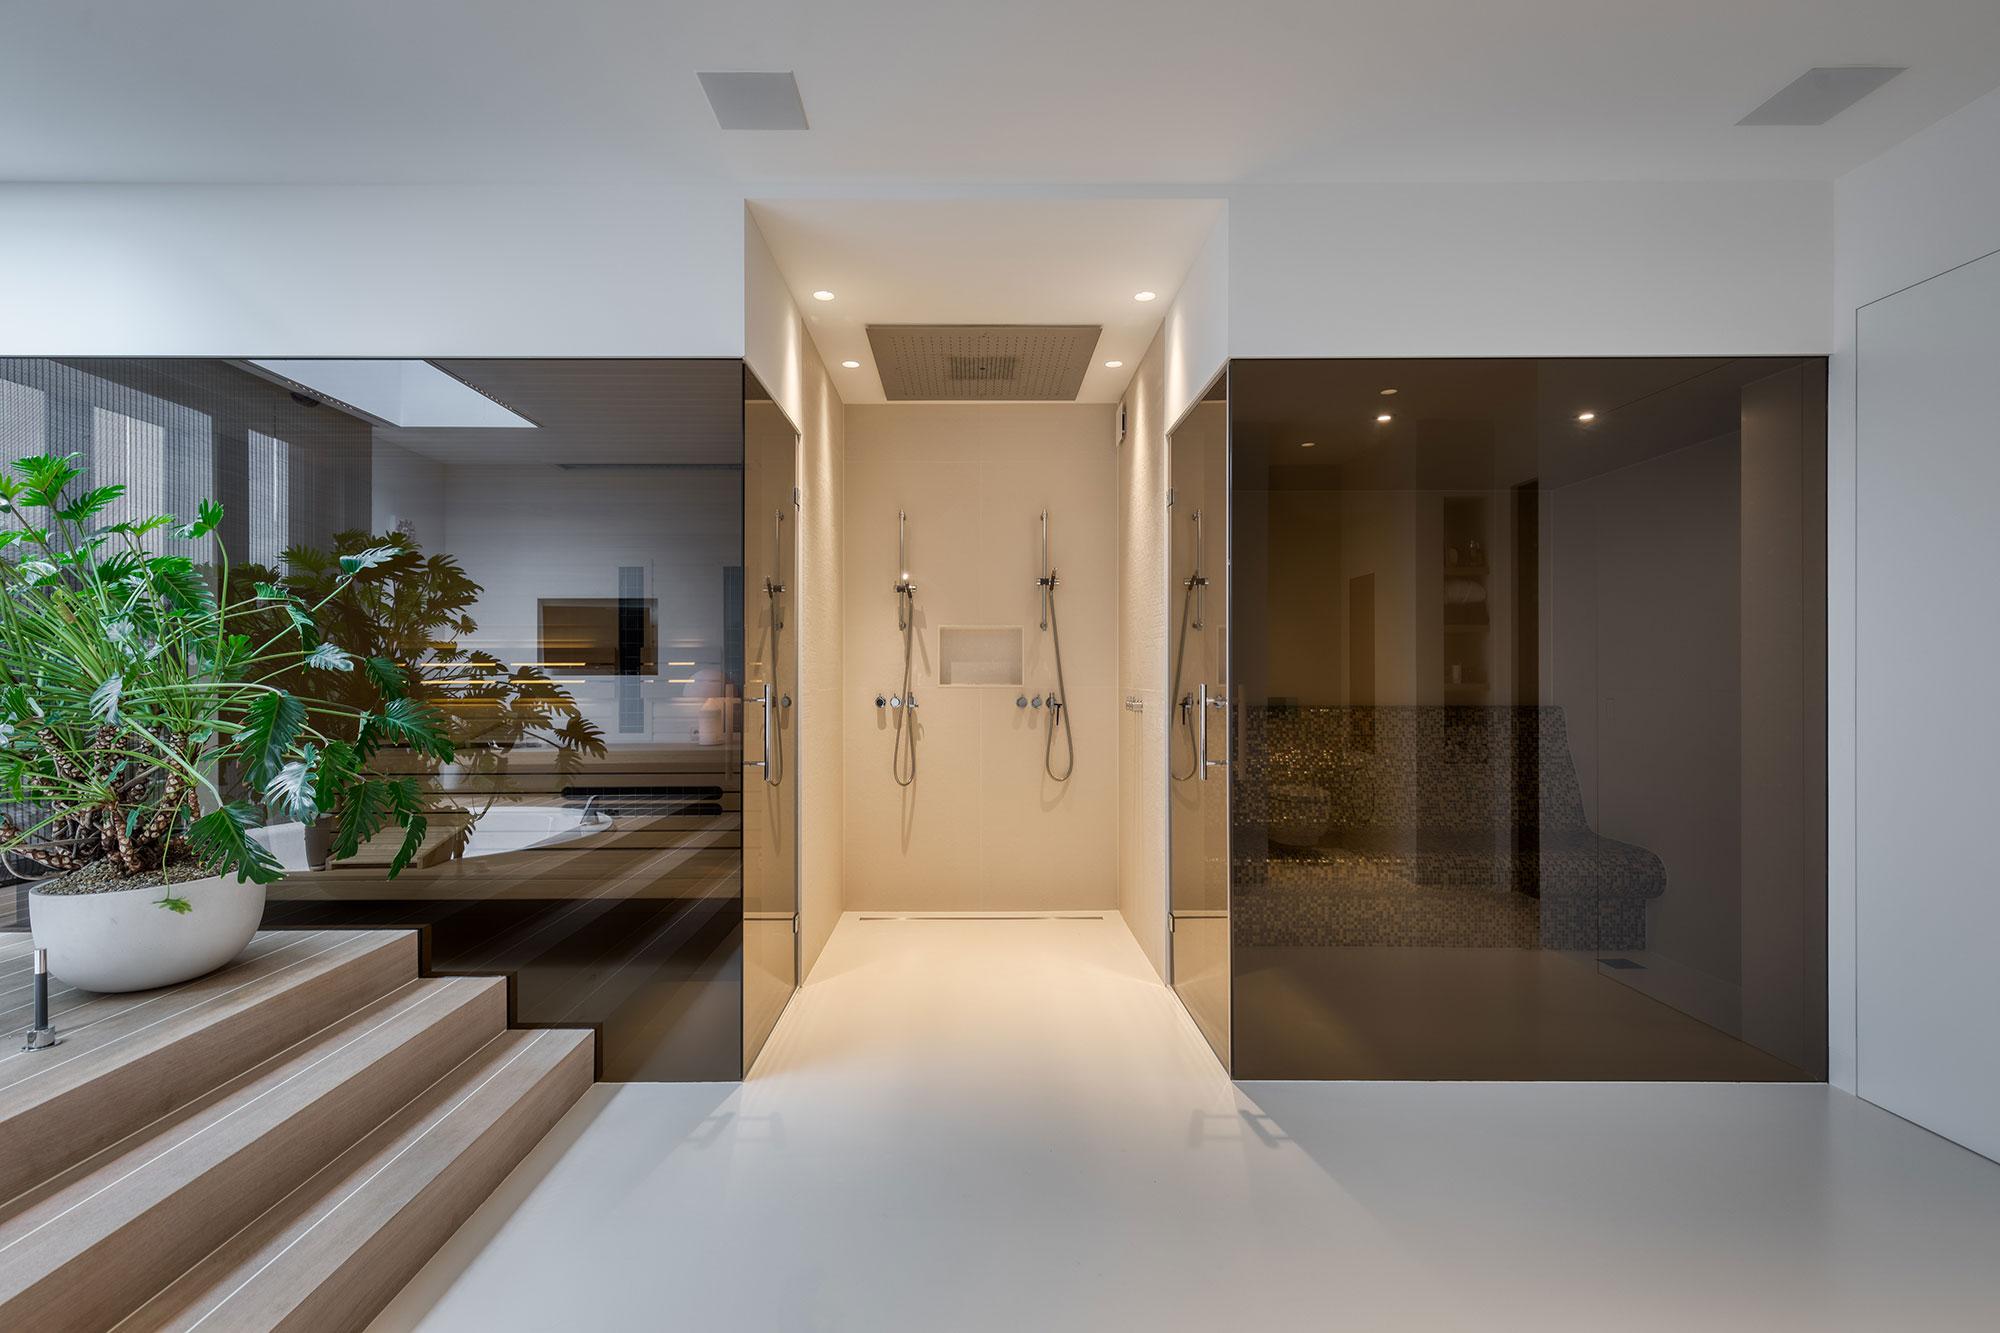 interieurarchitectuur wellness